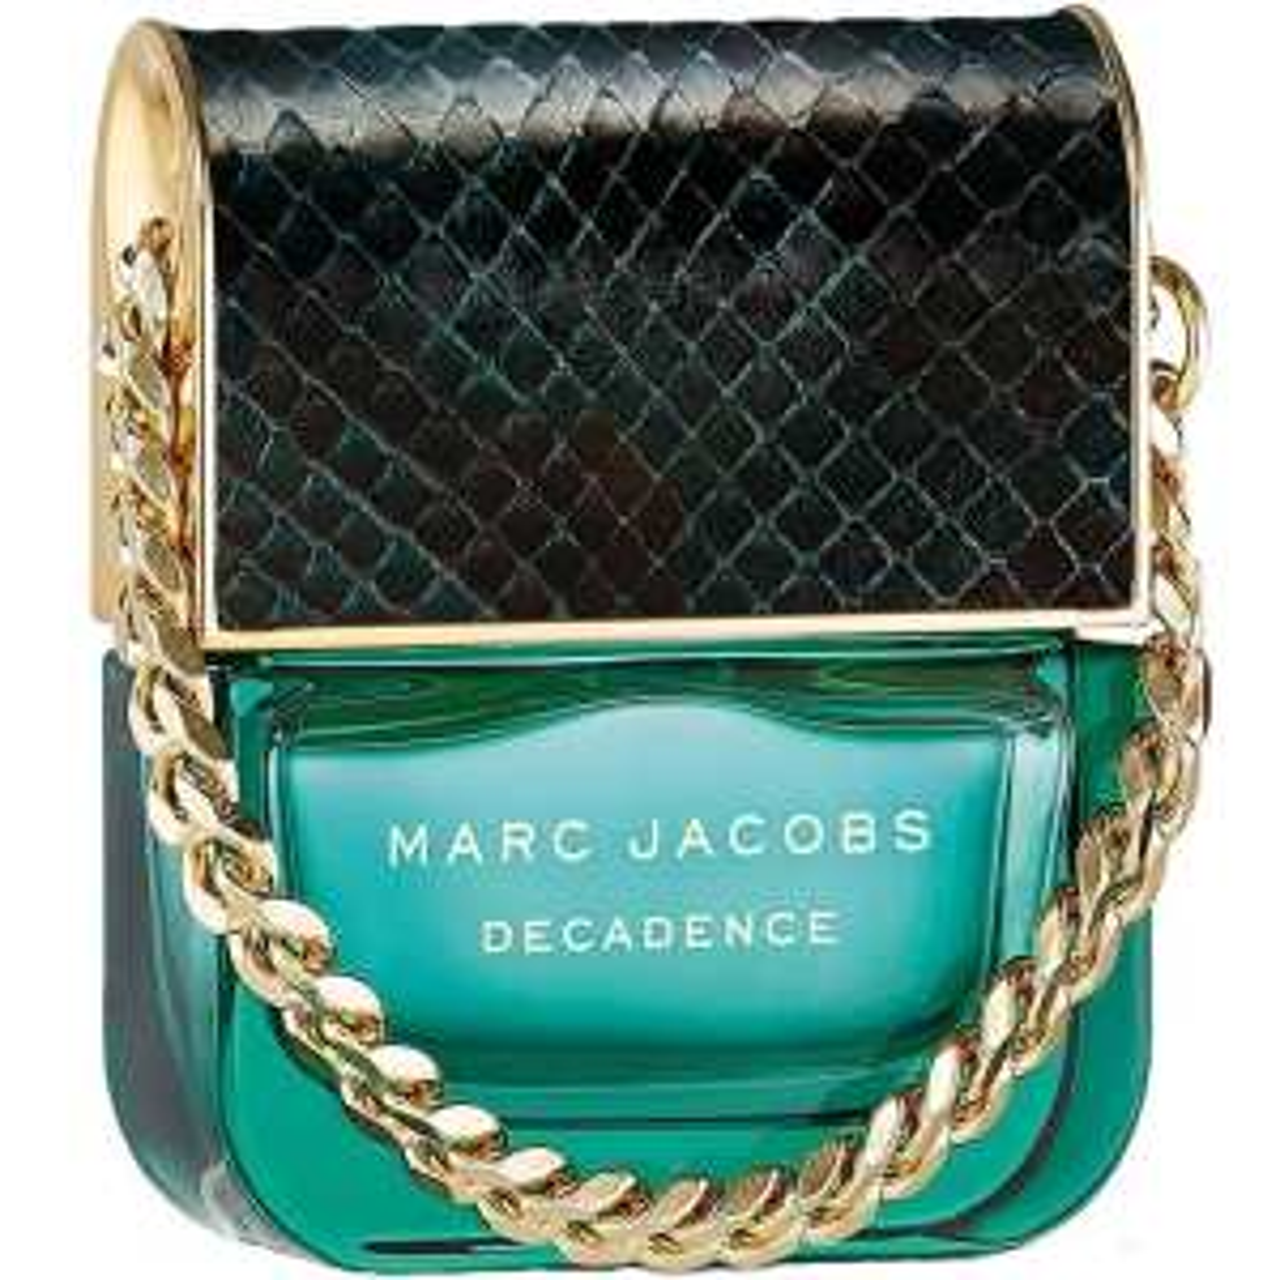 تستر ادو پرفیوم زنانه مارک جکوبس مدل Decadence حجم 100 میلی لیتر